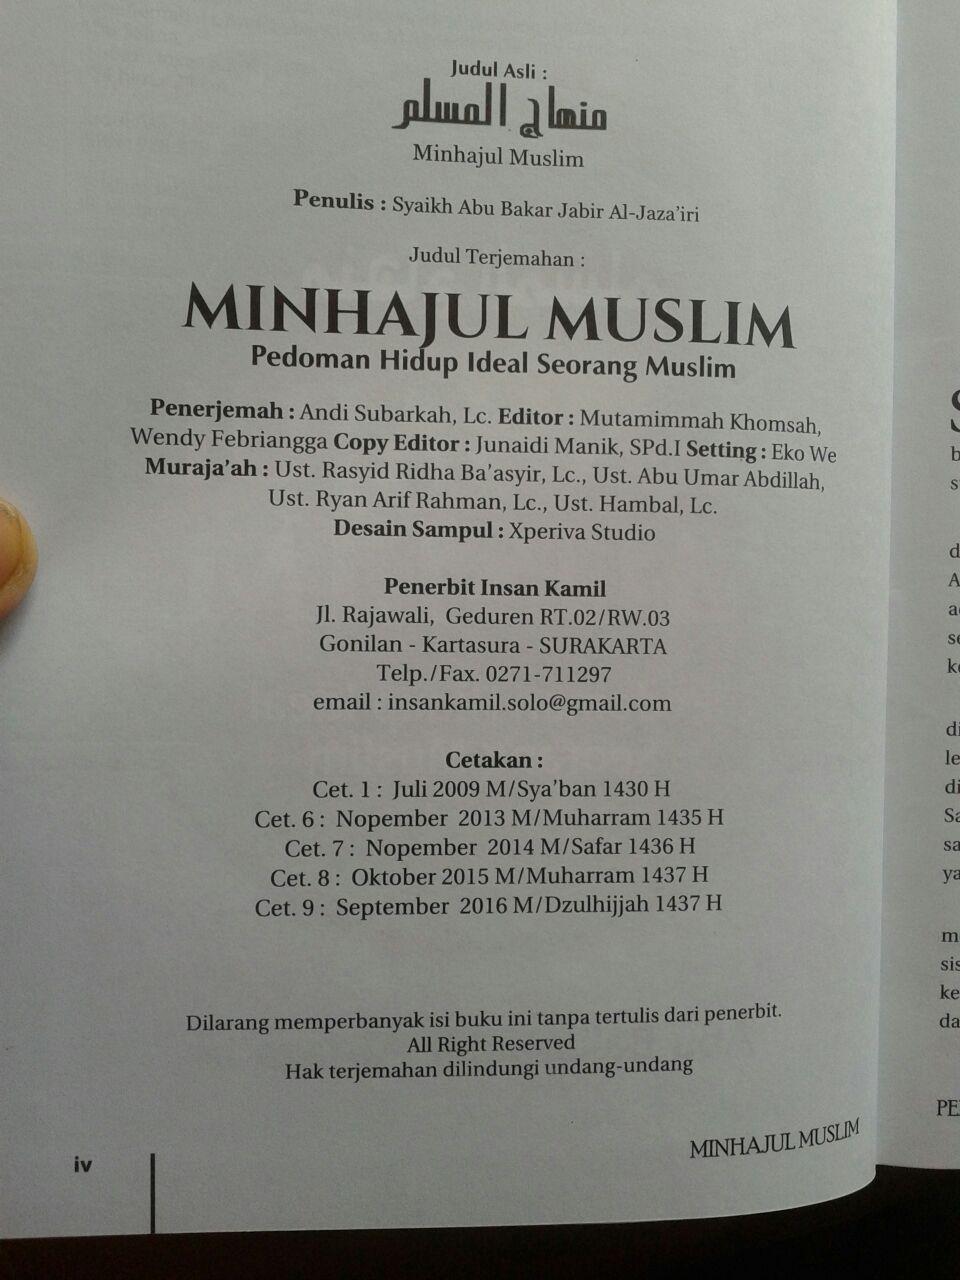 Buku Minhajul Muslim Pedoman Hidup Ideal Seorang Muslim isi 4